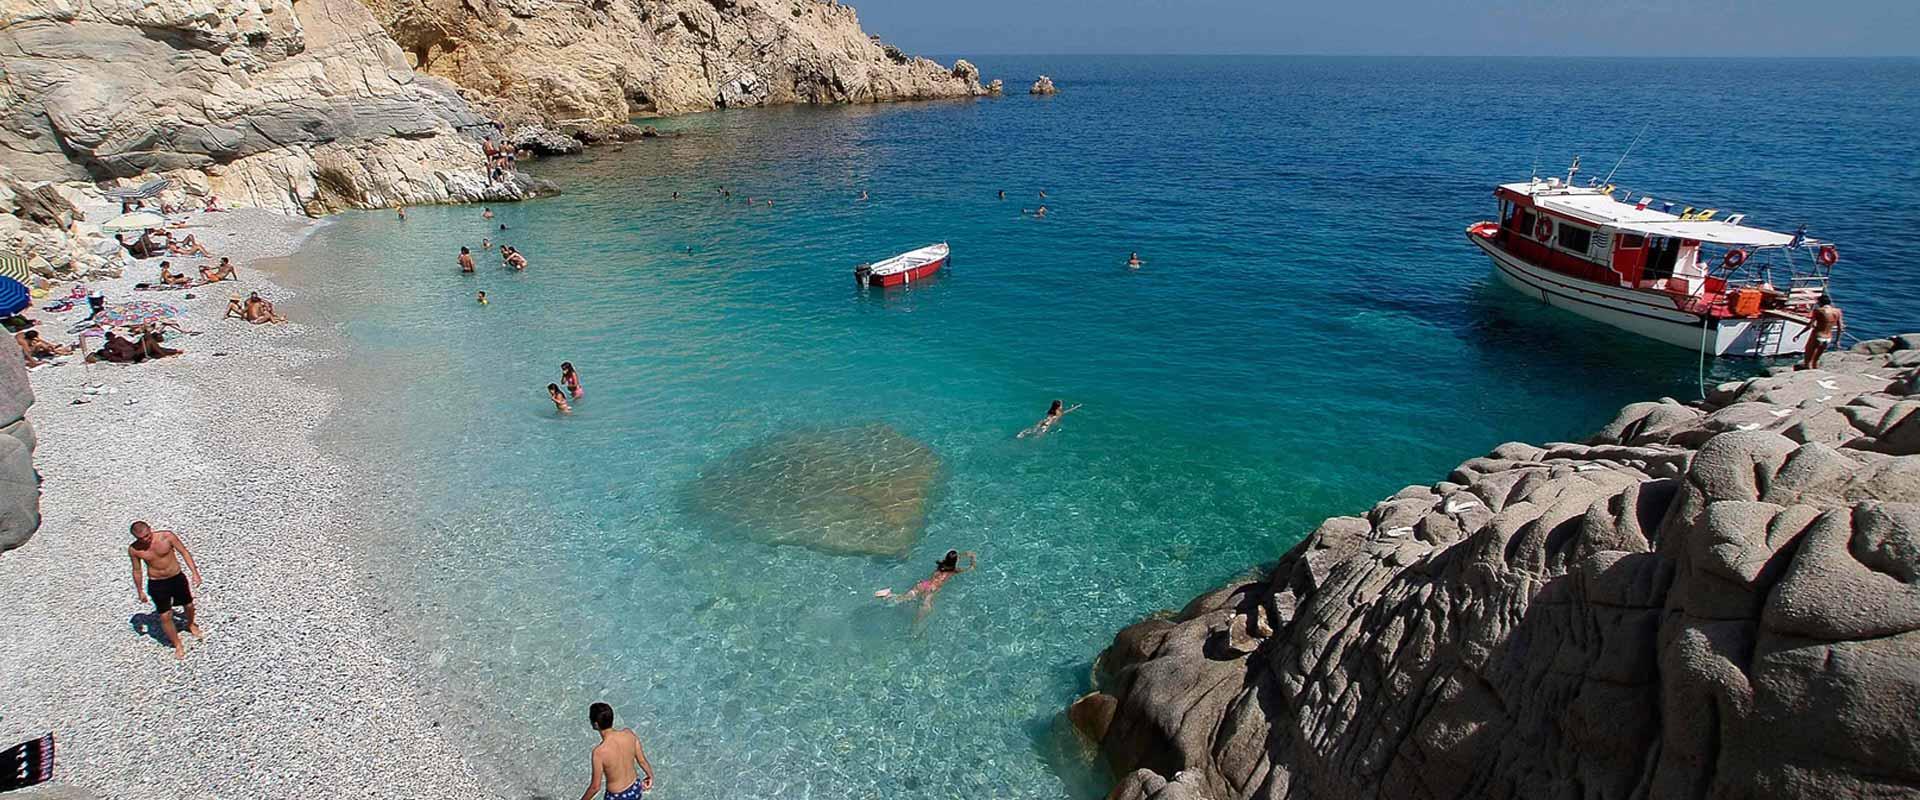 ikaria olivia villas beach picture